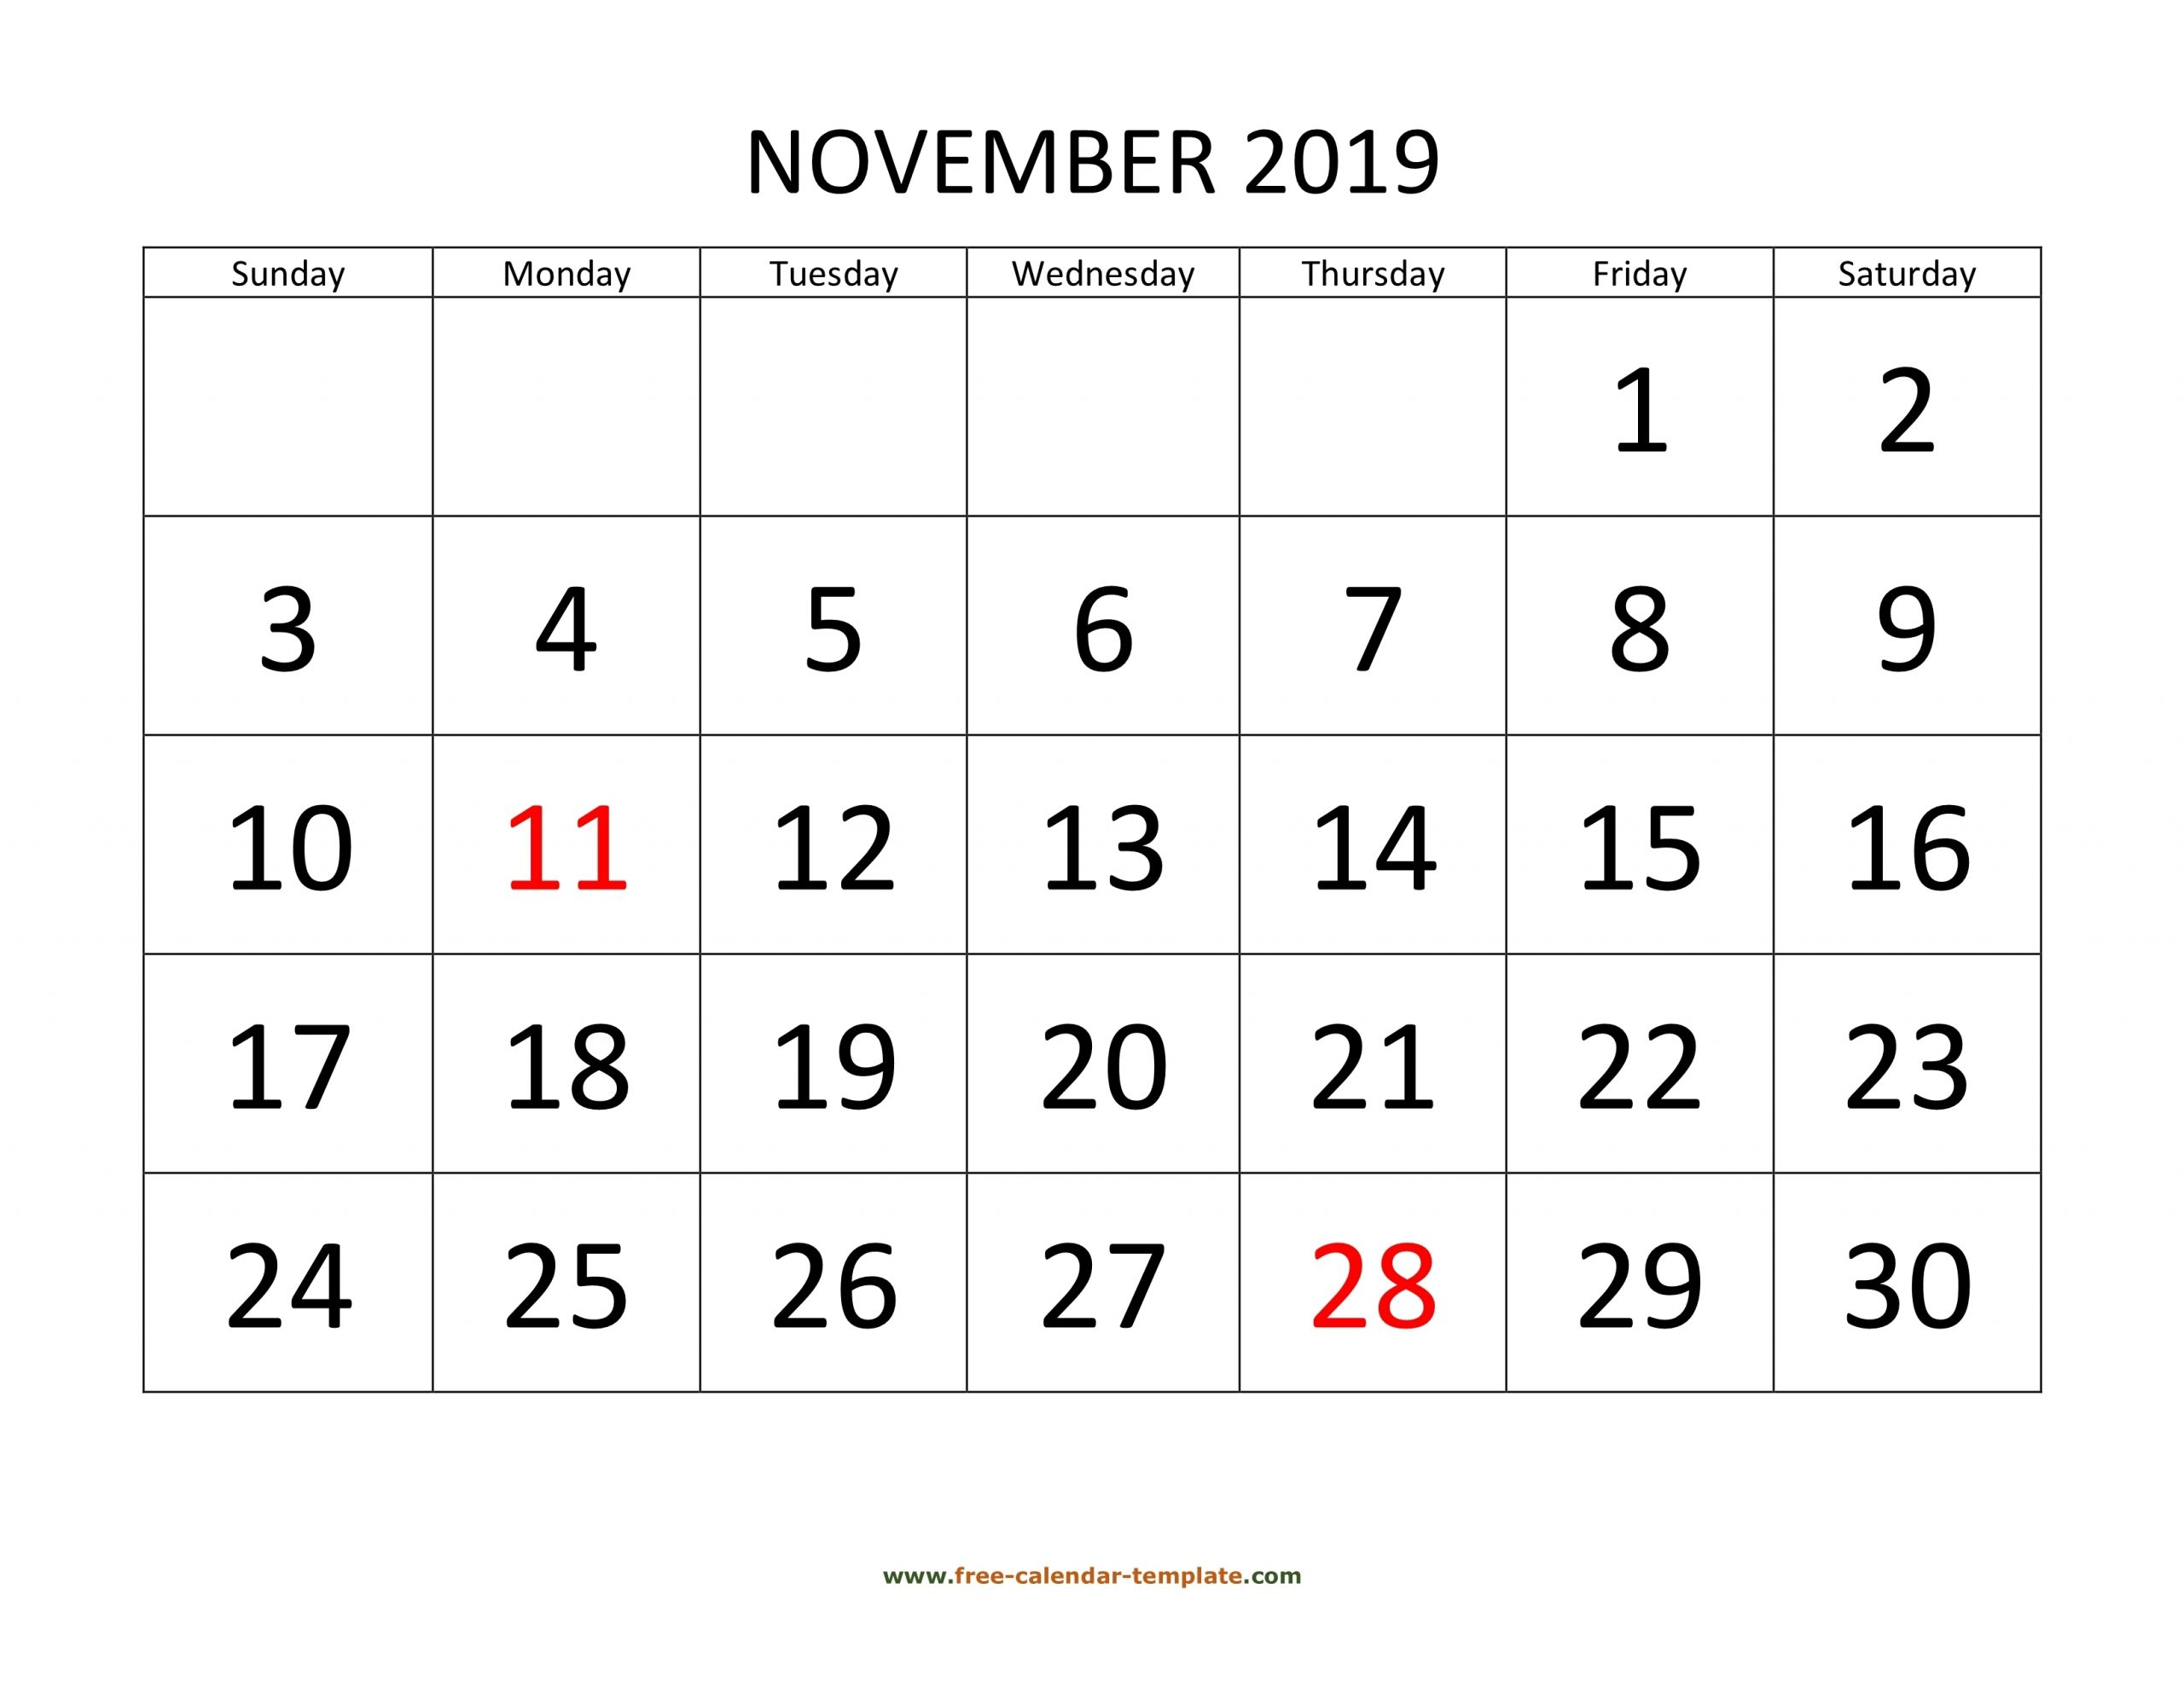 November 2019 Free Calendar Tempplate | Free-Calendar throughout Fill In Calendar 2019 Pdf